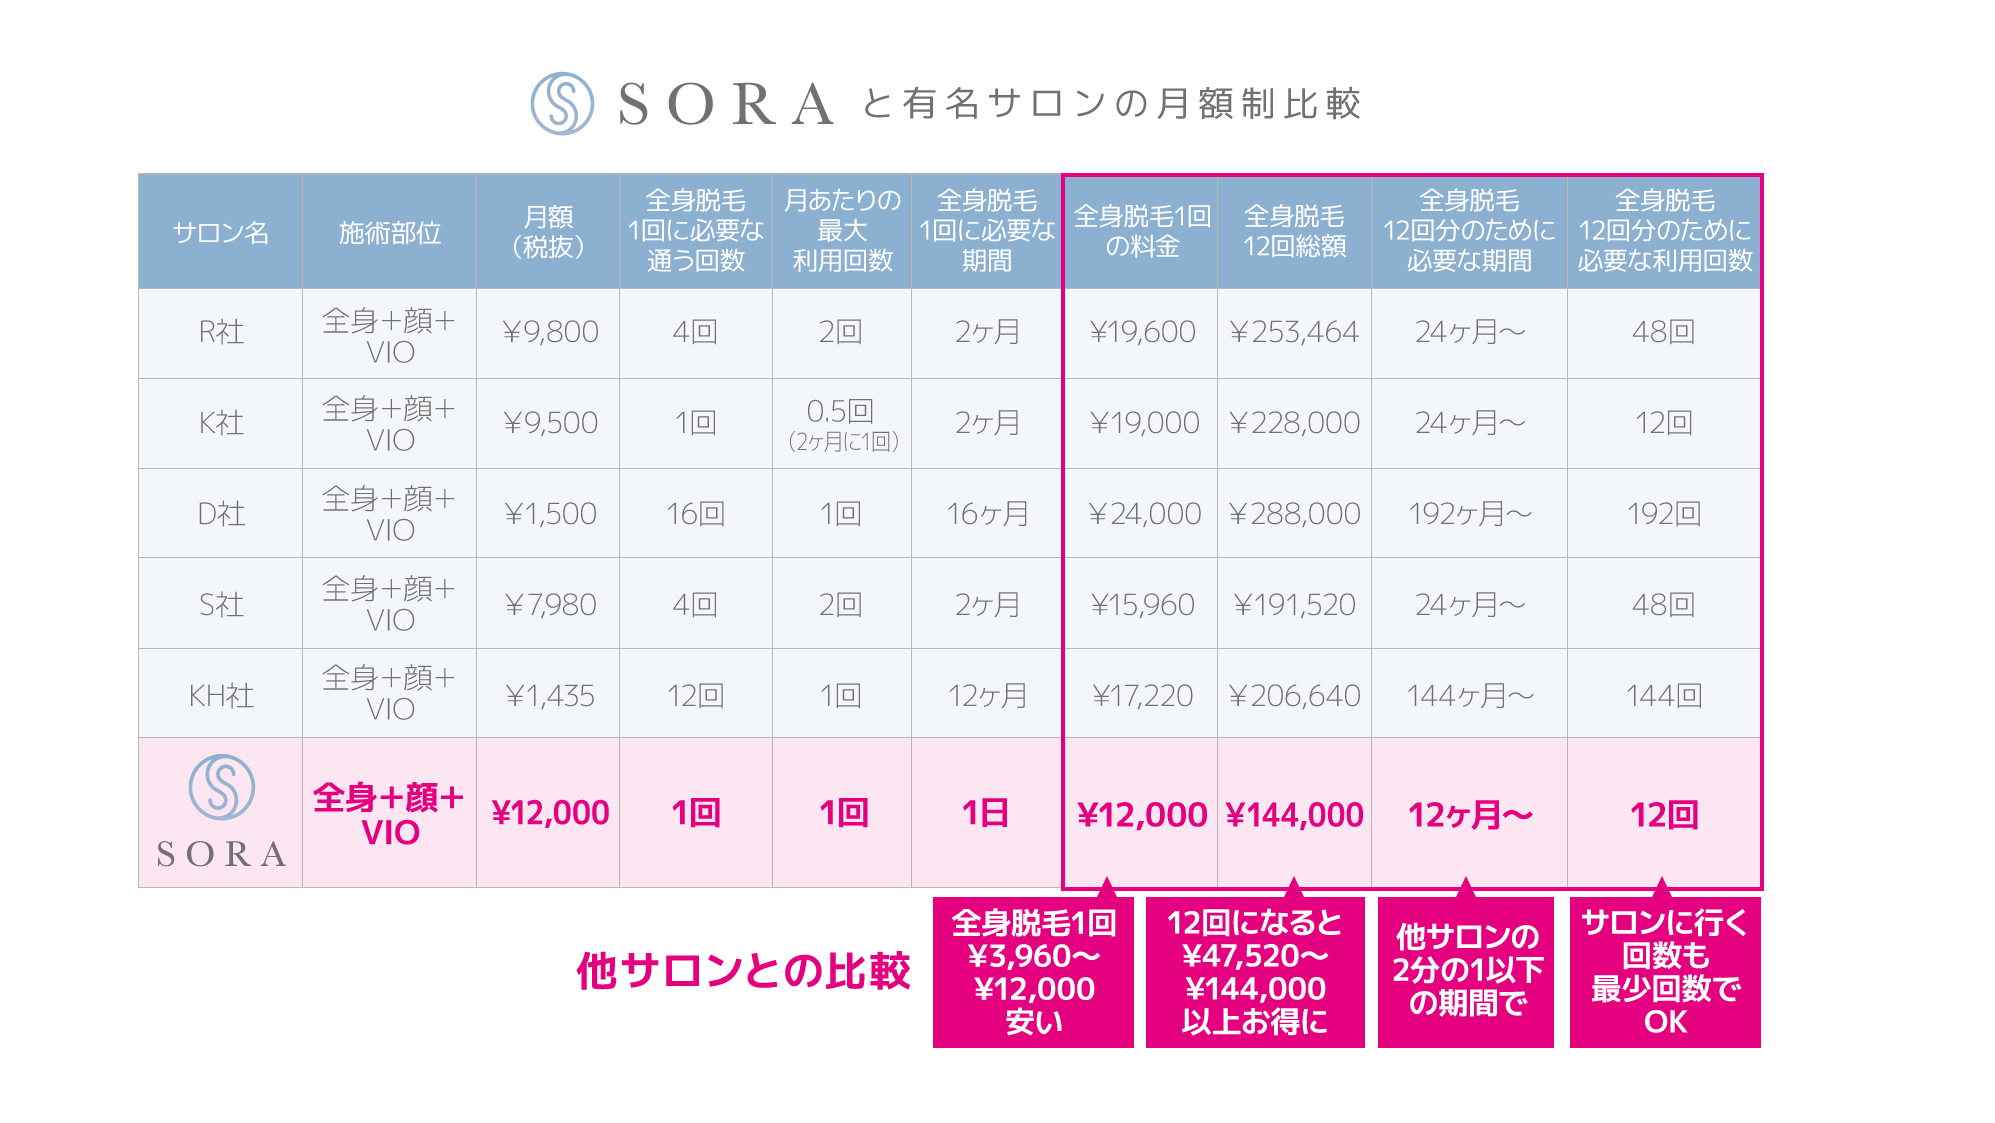 SORAと有名サロンの月額制比較表